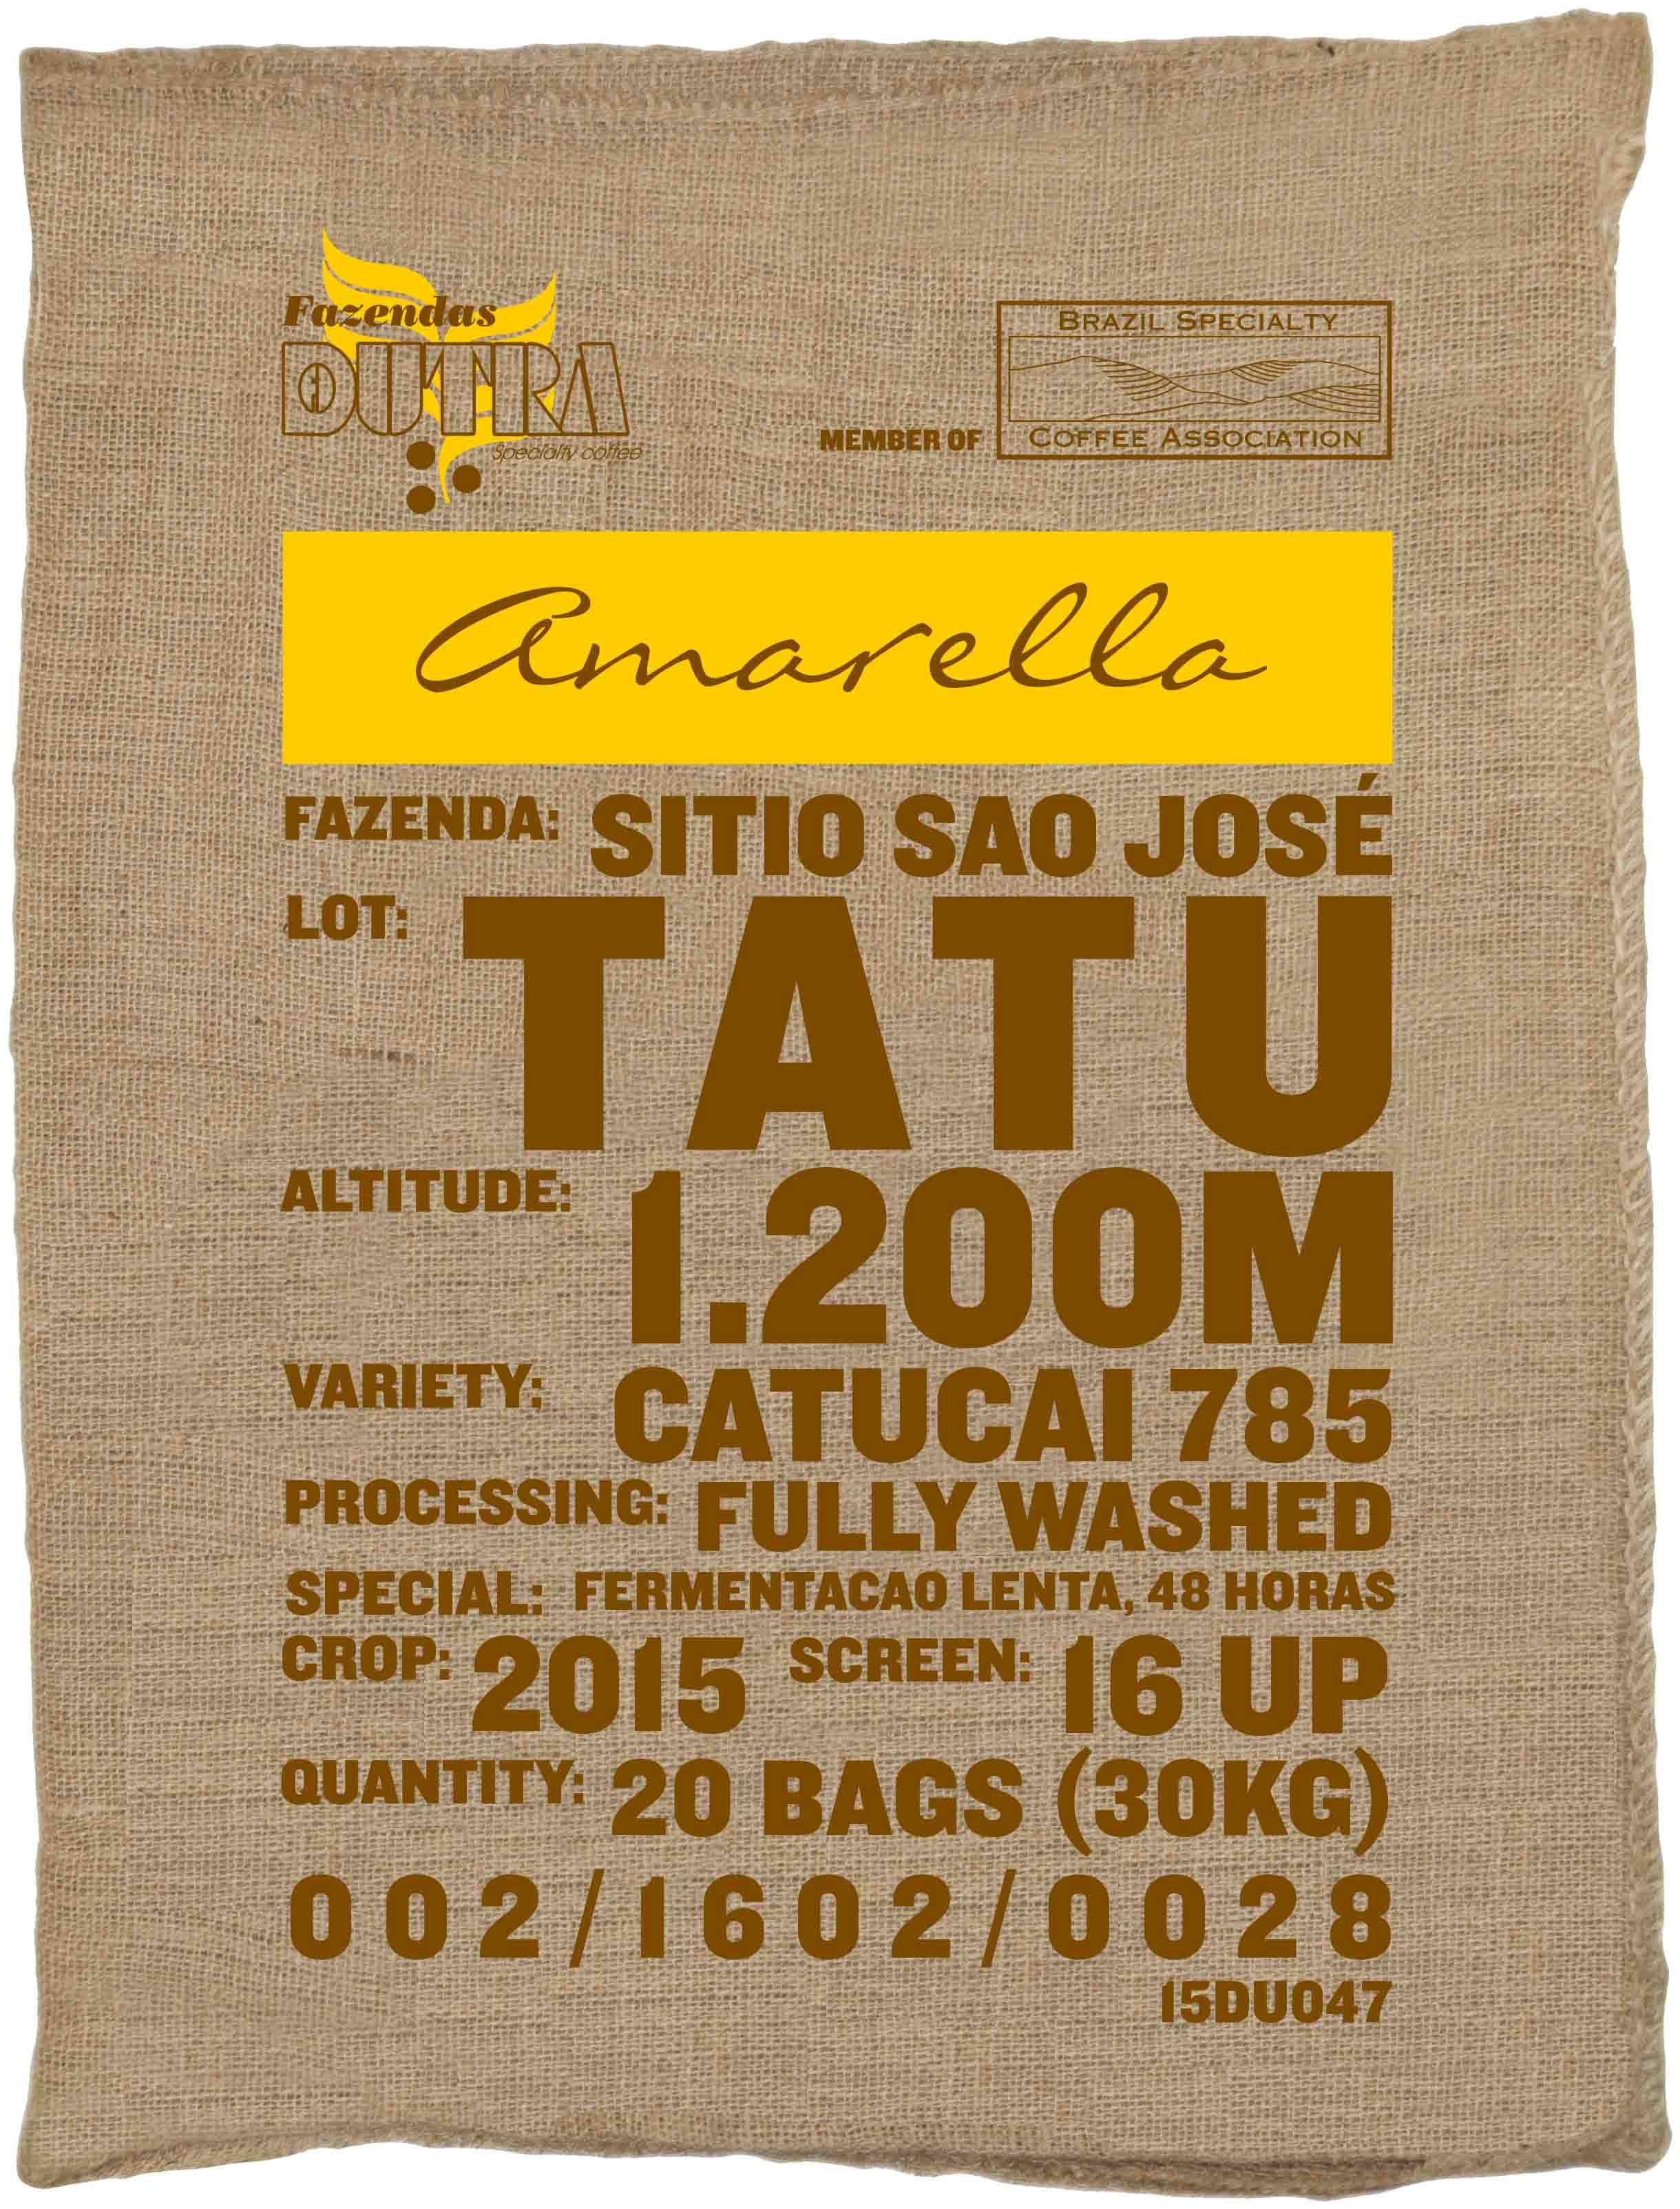 Ein Rohkaffeesack amarella Parzellenkaffee Varietät Catucai 785. Fazendas Dutra Lot Tatu.